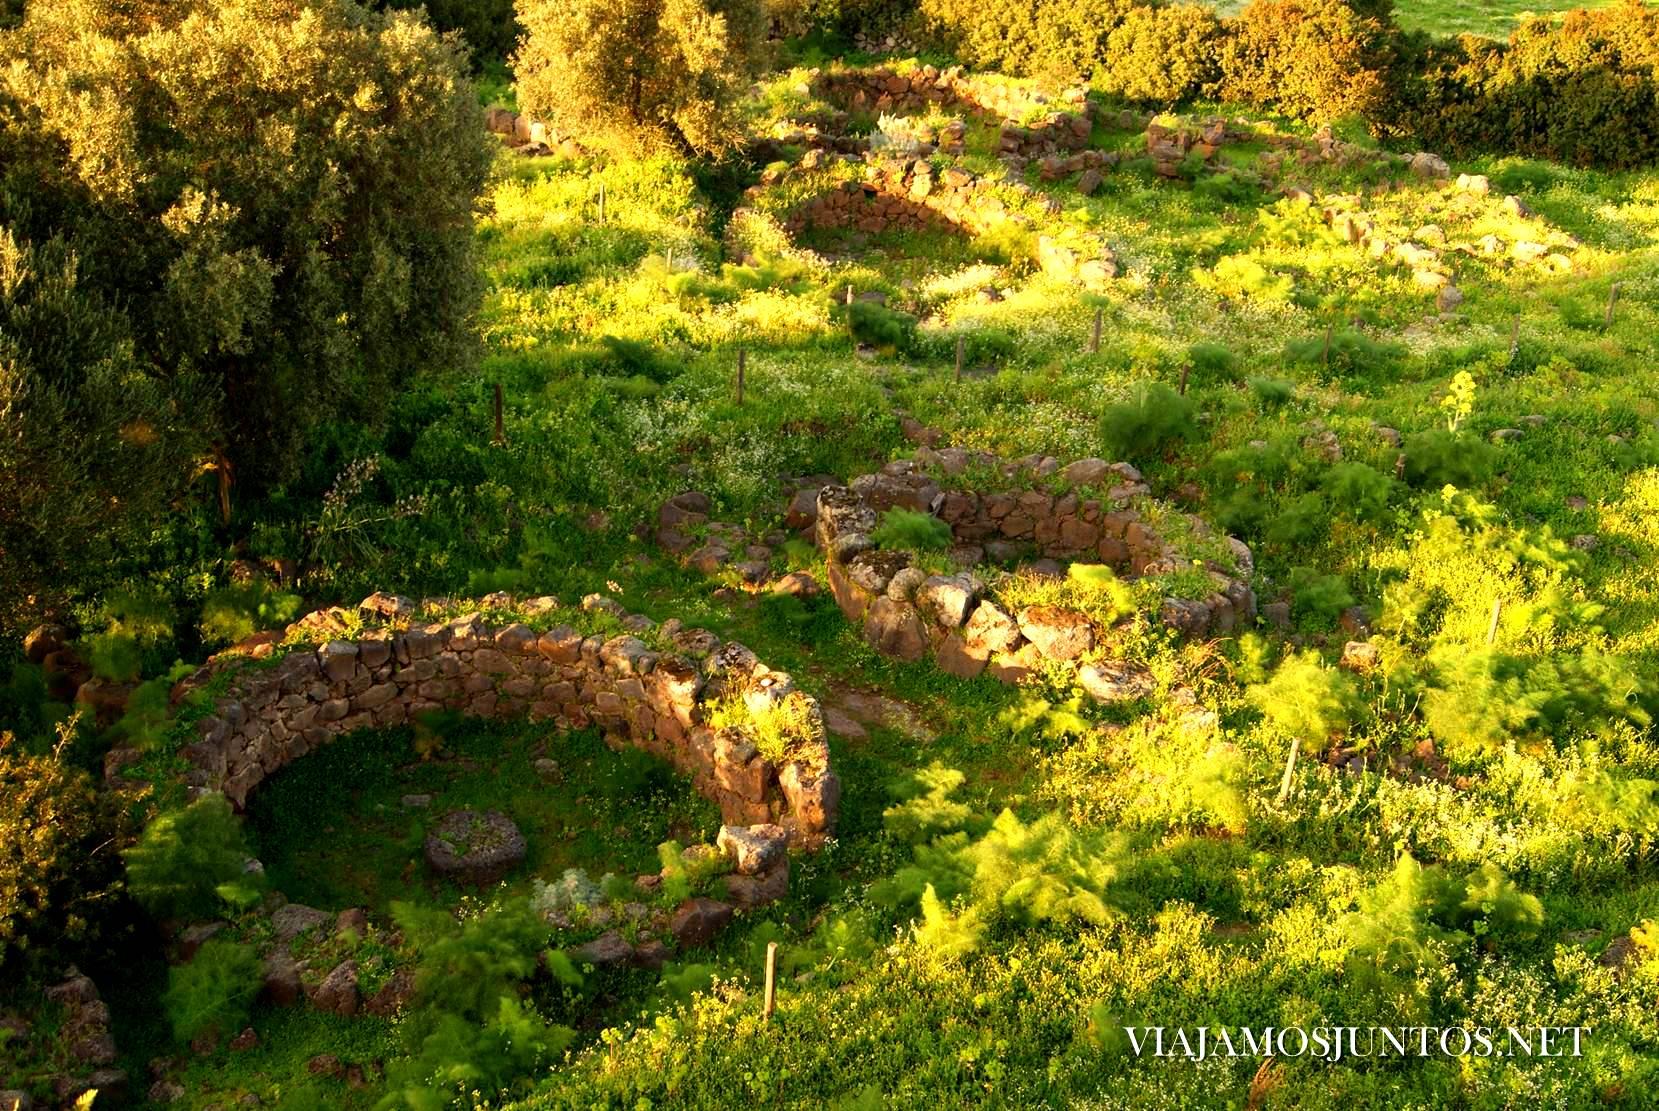 Italia, Cerdeña, Sardinia, viajar por libre, descubrir Cerdeña, indiana jones, aventura, nuraghe, tumba de gigantes, necropoli, tempiete